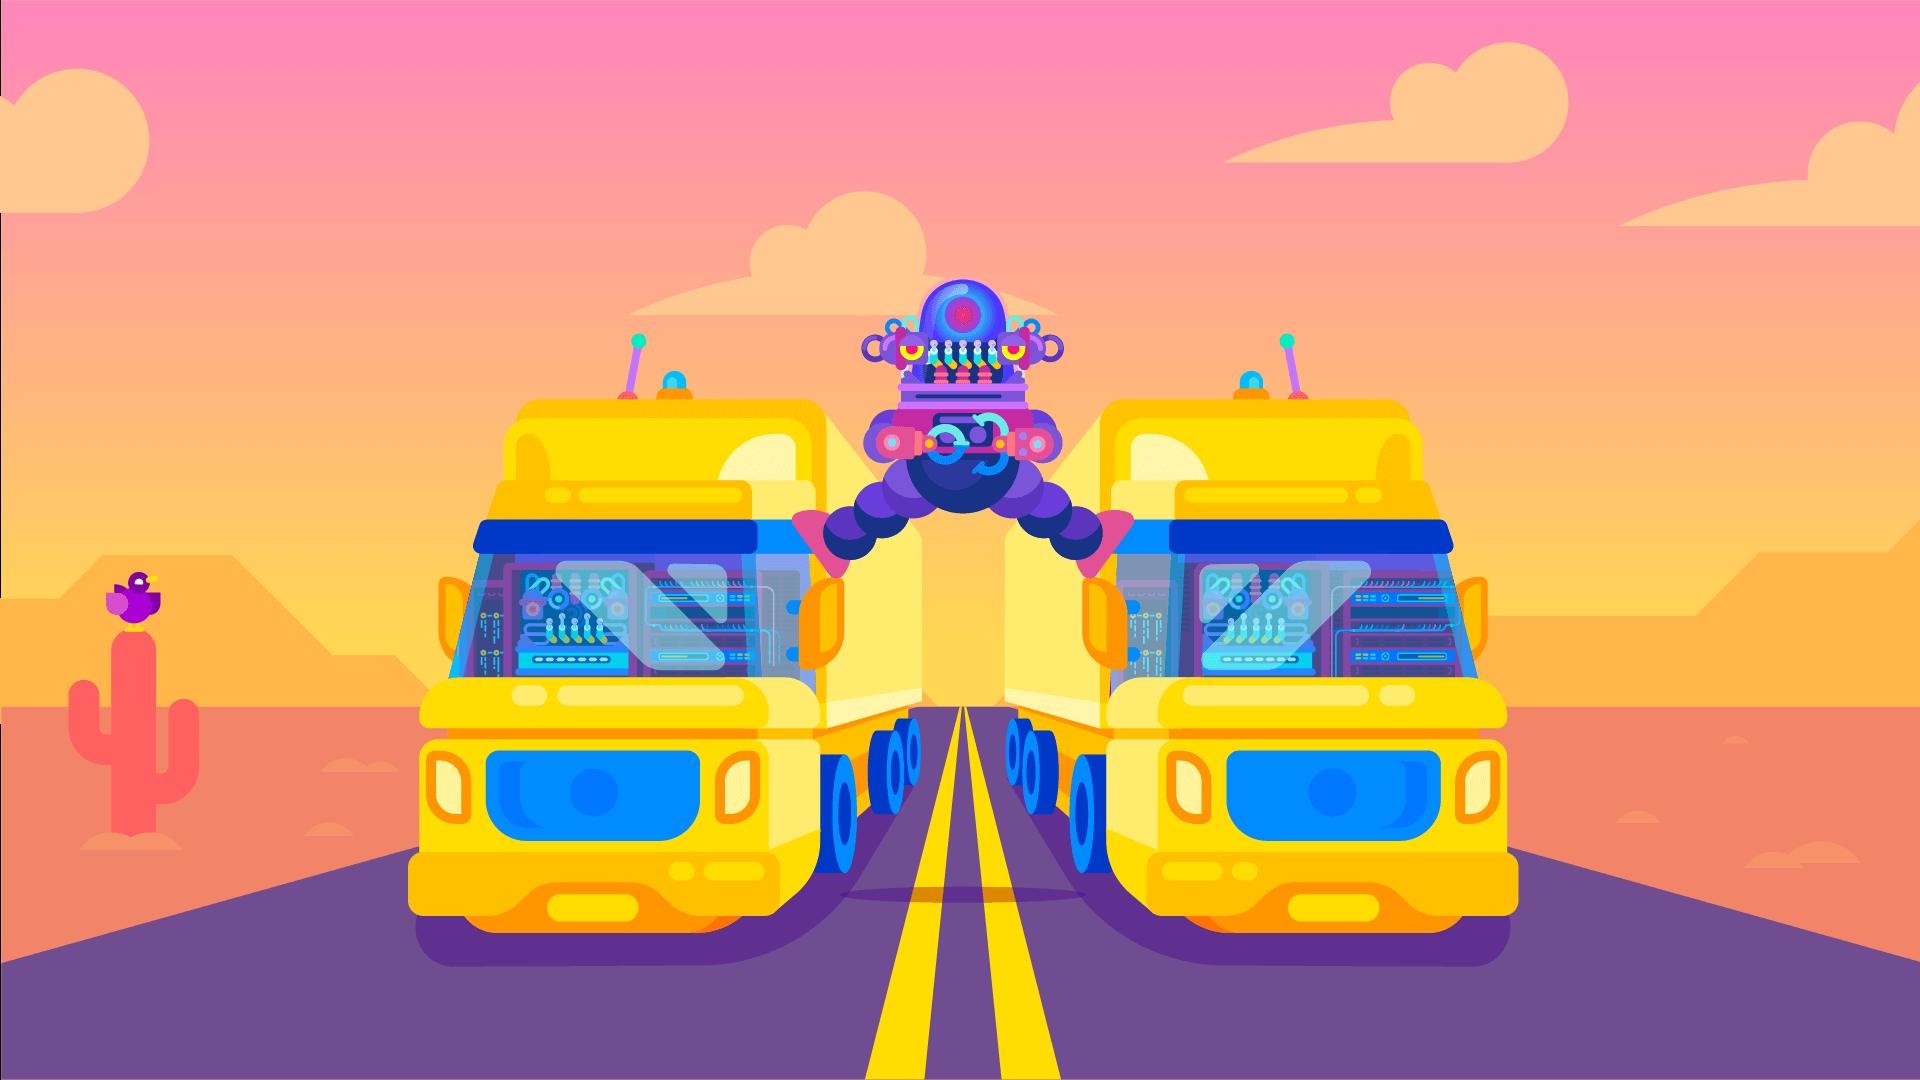 inanutshell-kurzgesagt-Automation-05